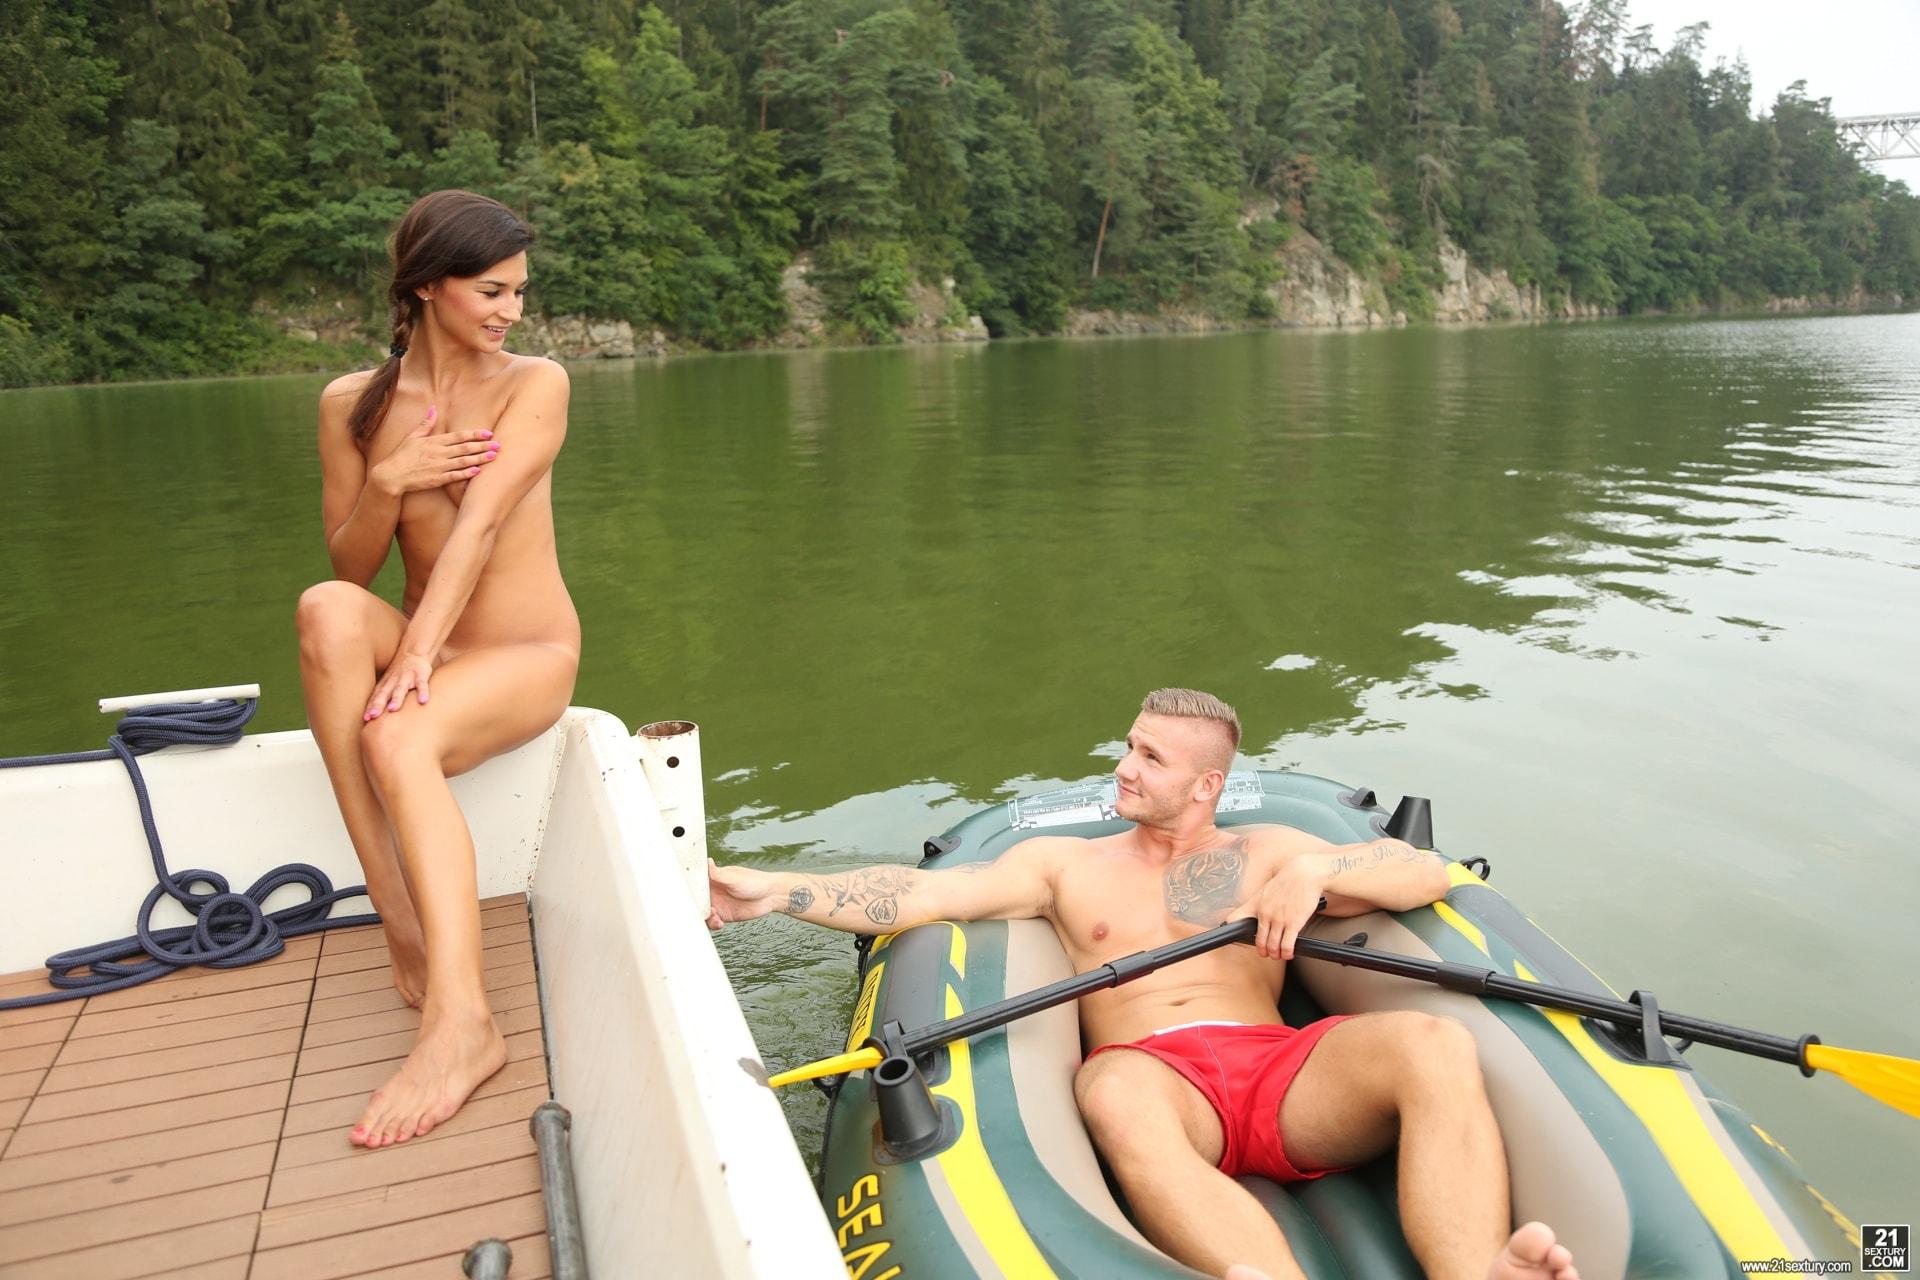 21Sextury 'No Tan Lines' starring Adela (Photo 5)